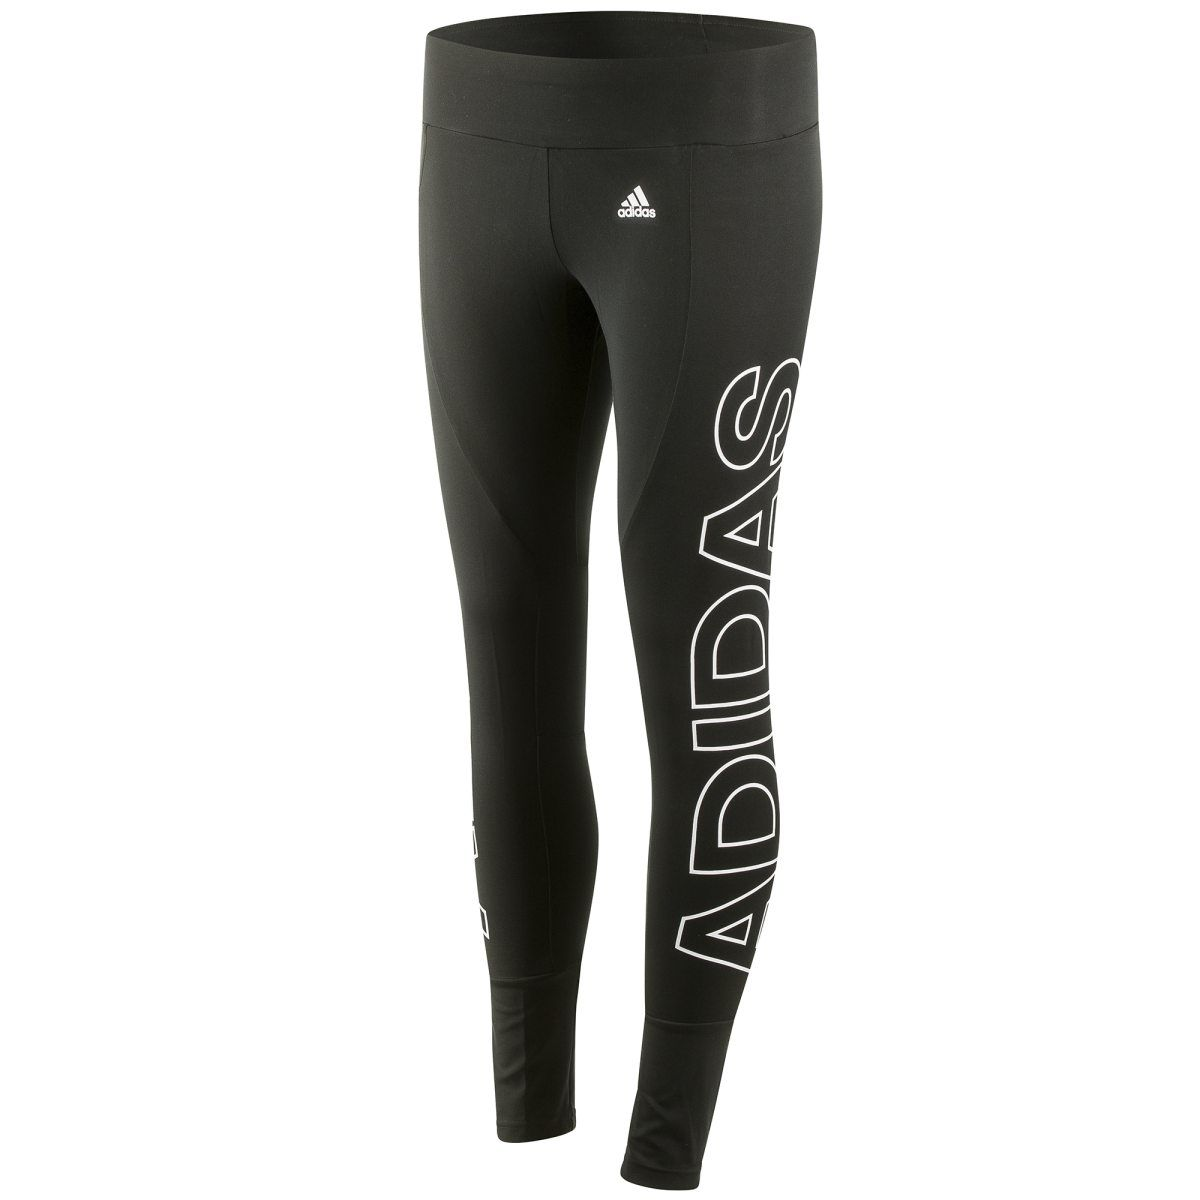 8ca098a1328 Adidas ESSENTIAL TRACK PANT - AB2406   Γυναικεία αθλητικά ρούχα   Cuffed  pants, Adidas και Les gold